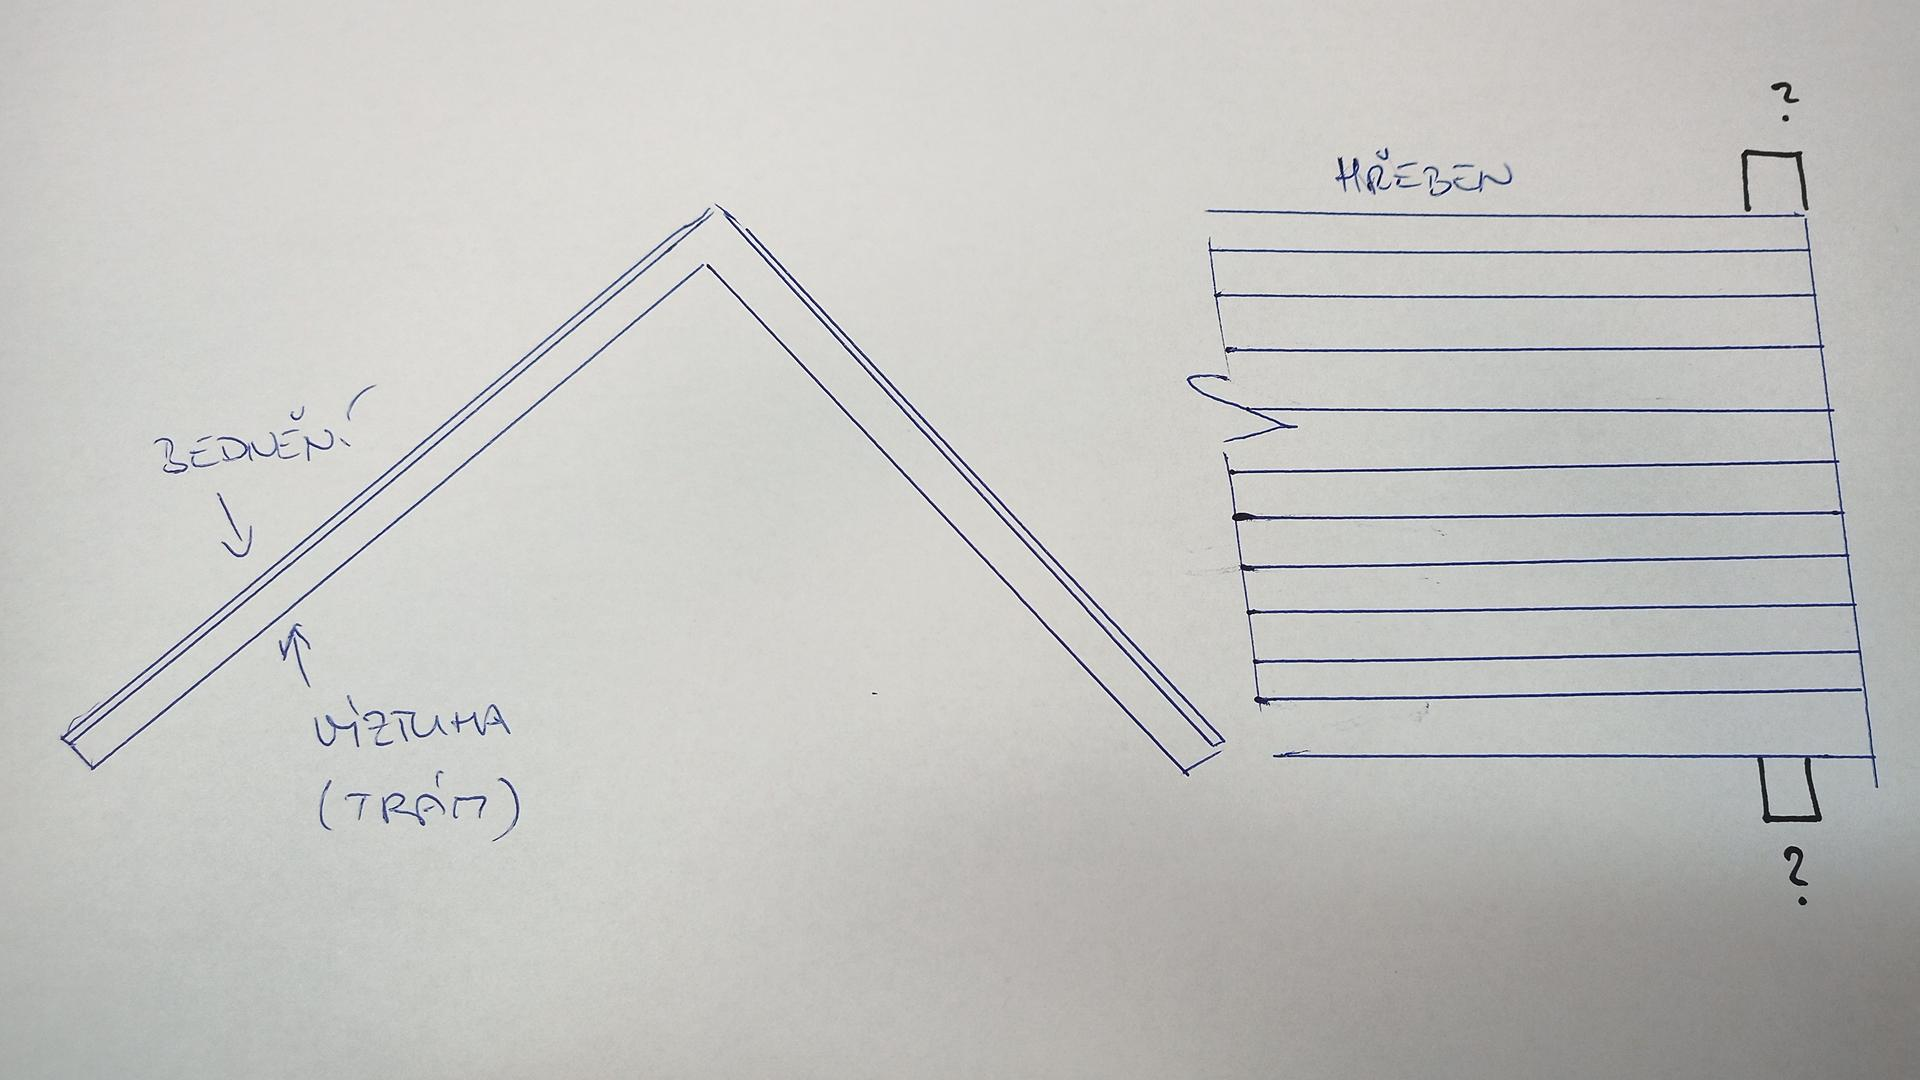 Ahoj, dělám rekonstrukci střechy a... - Obrázek č. 2